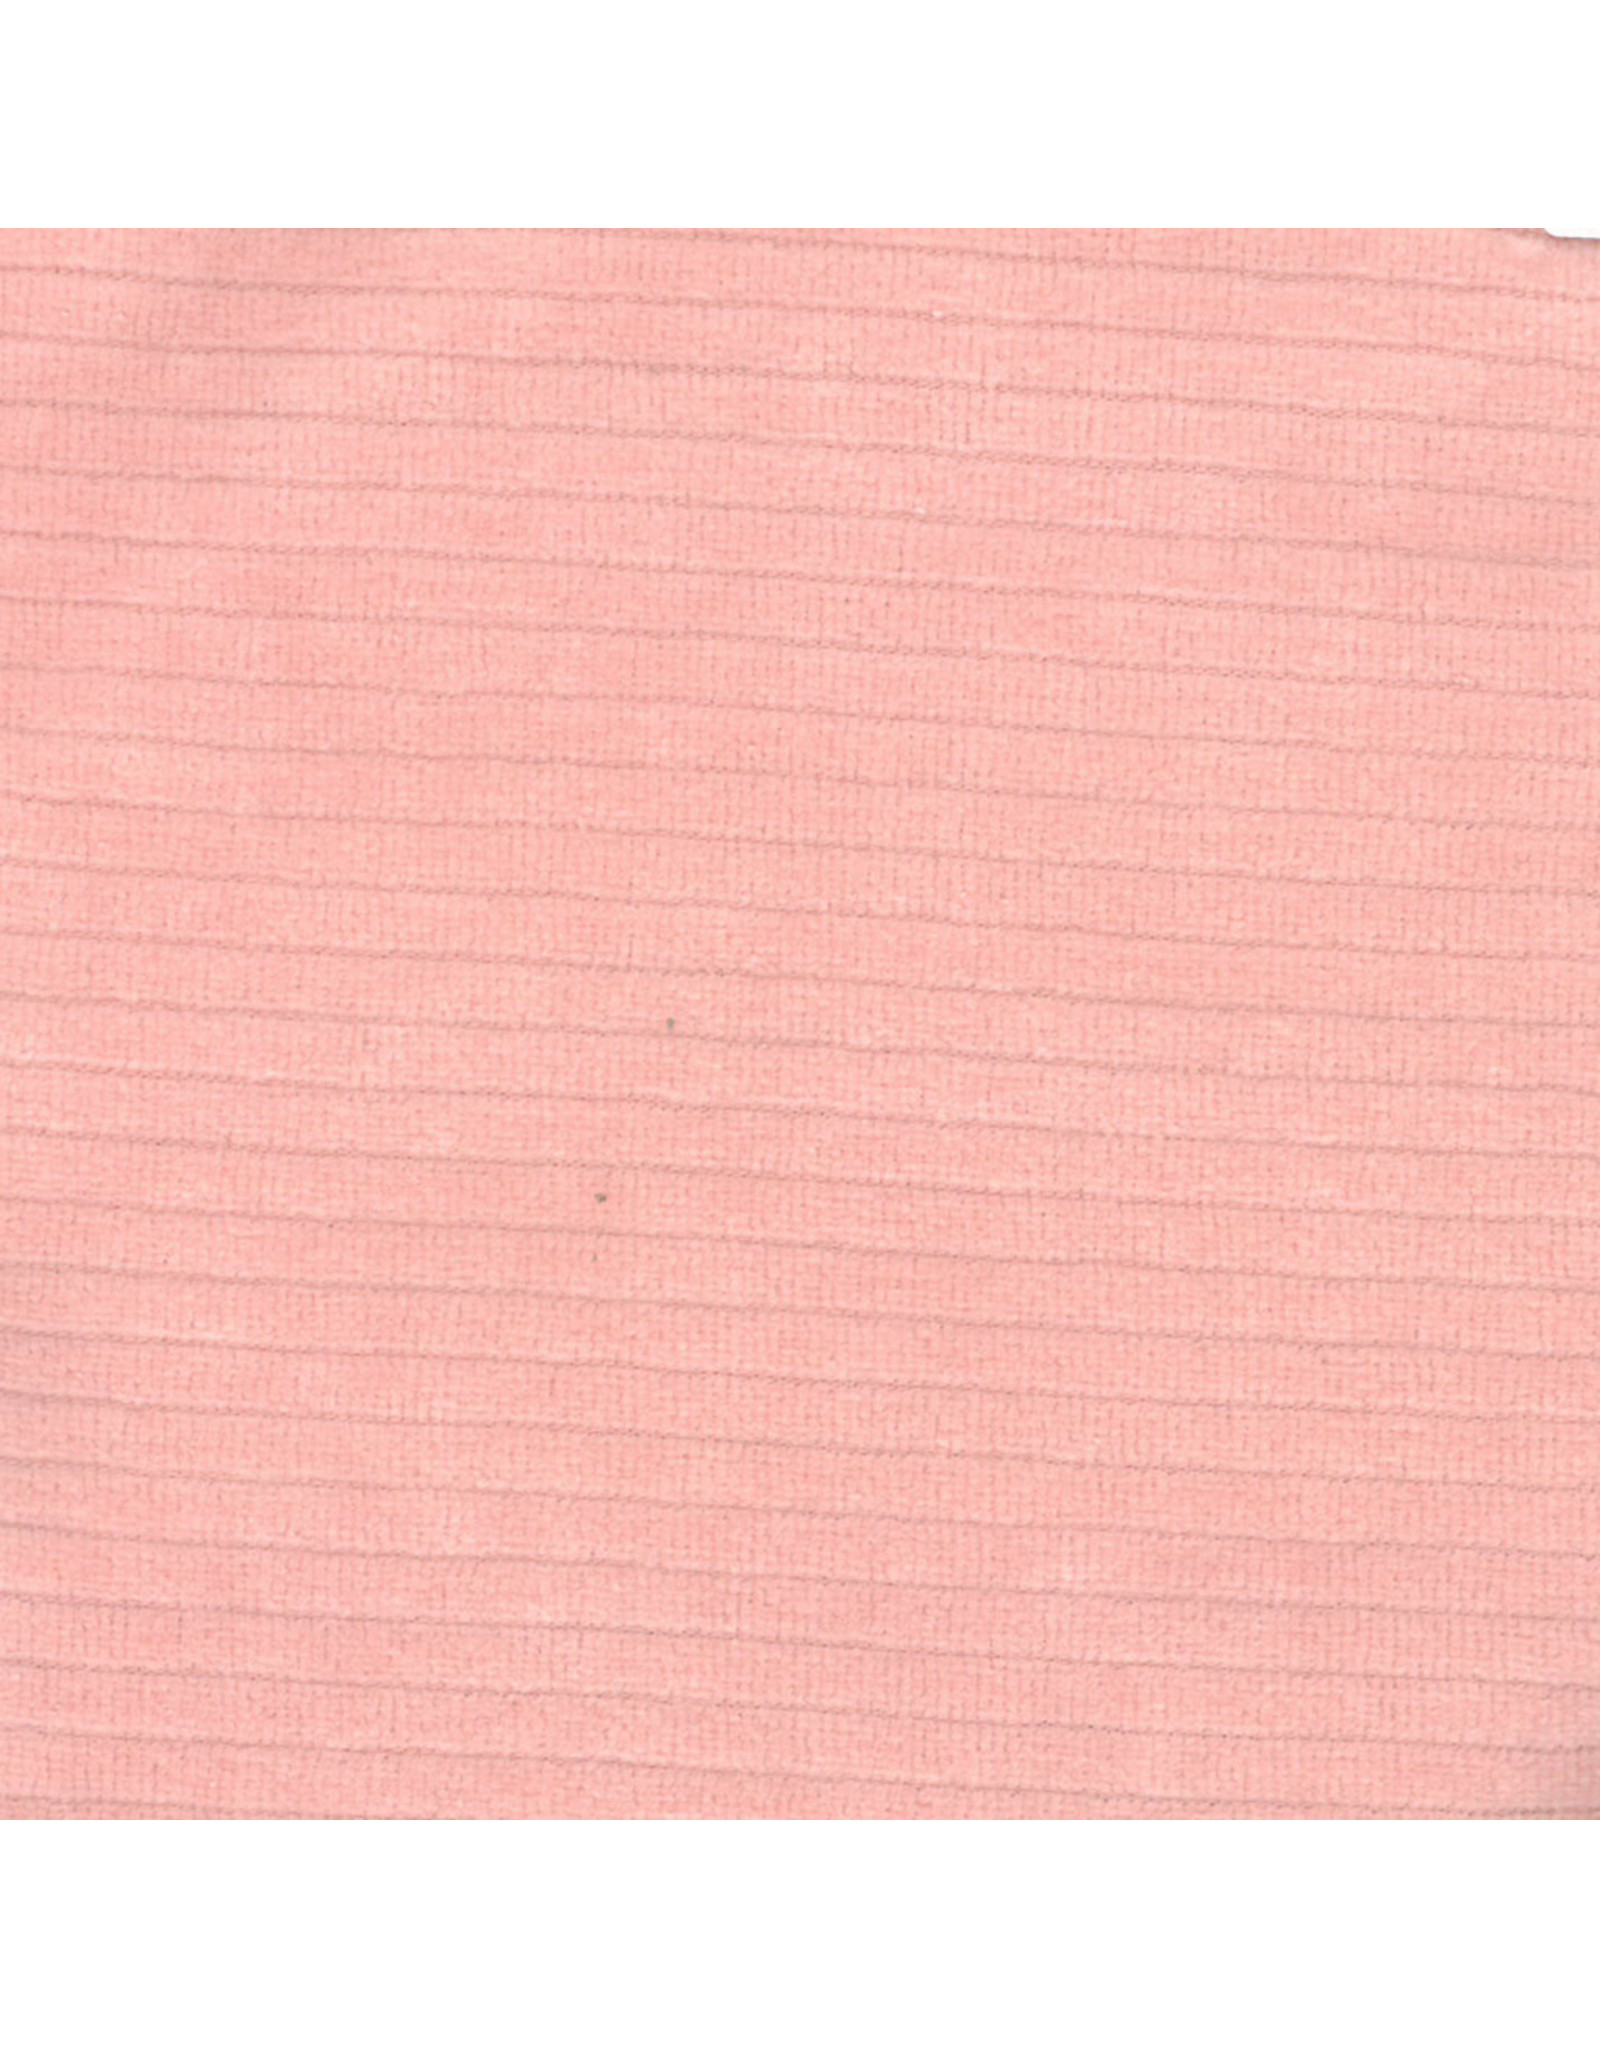 Stik-Stof Ribbed terry knit rose